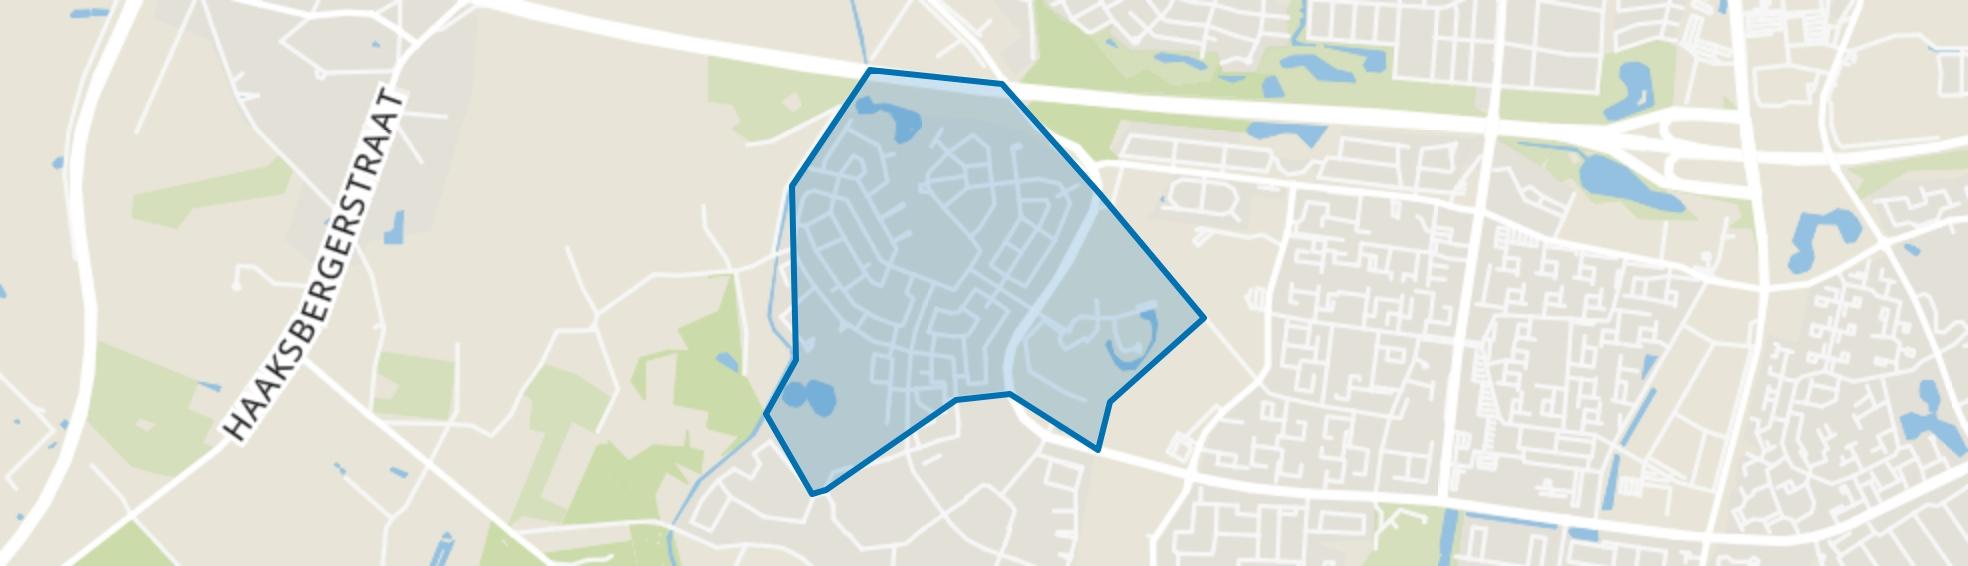 Helmerhoek-Noord, Enschede map